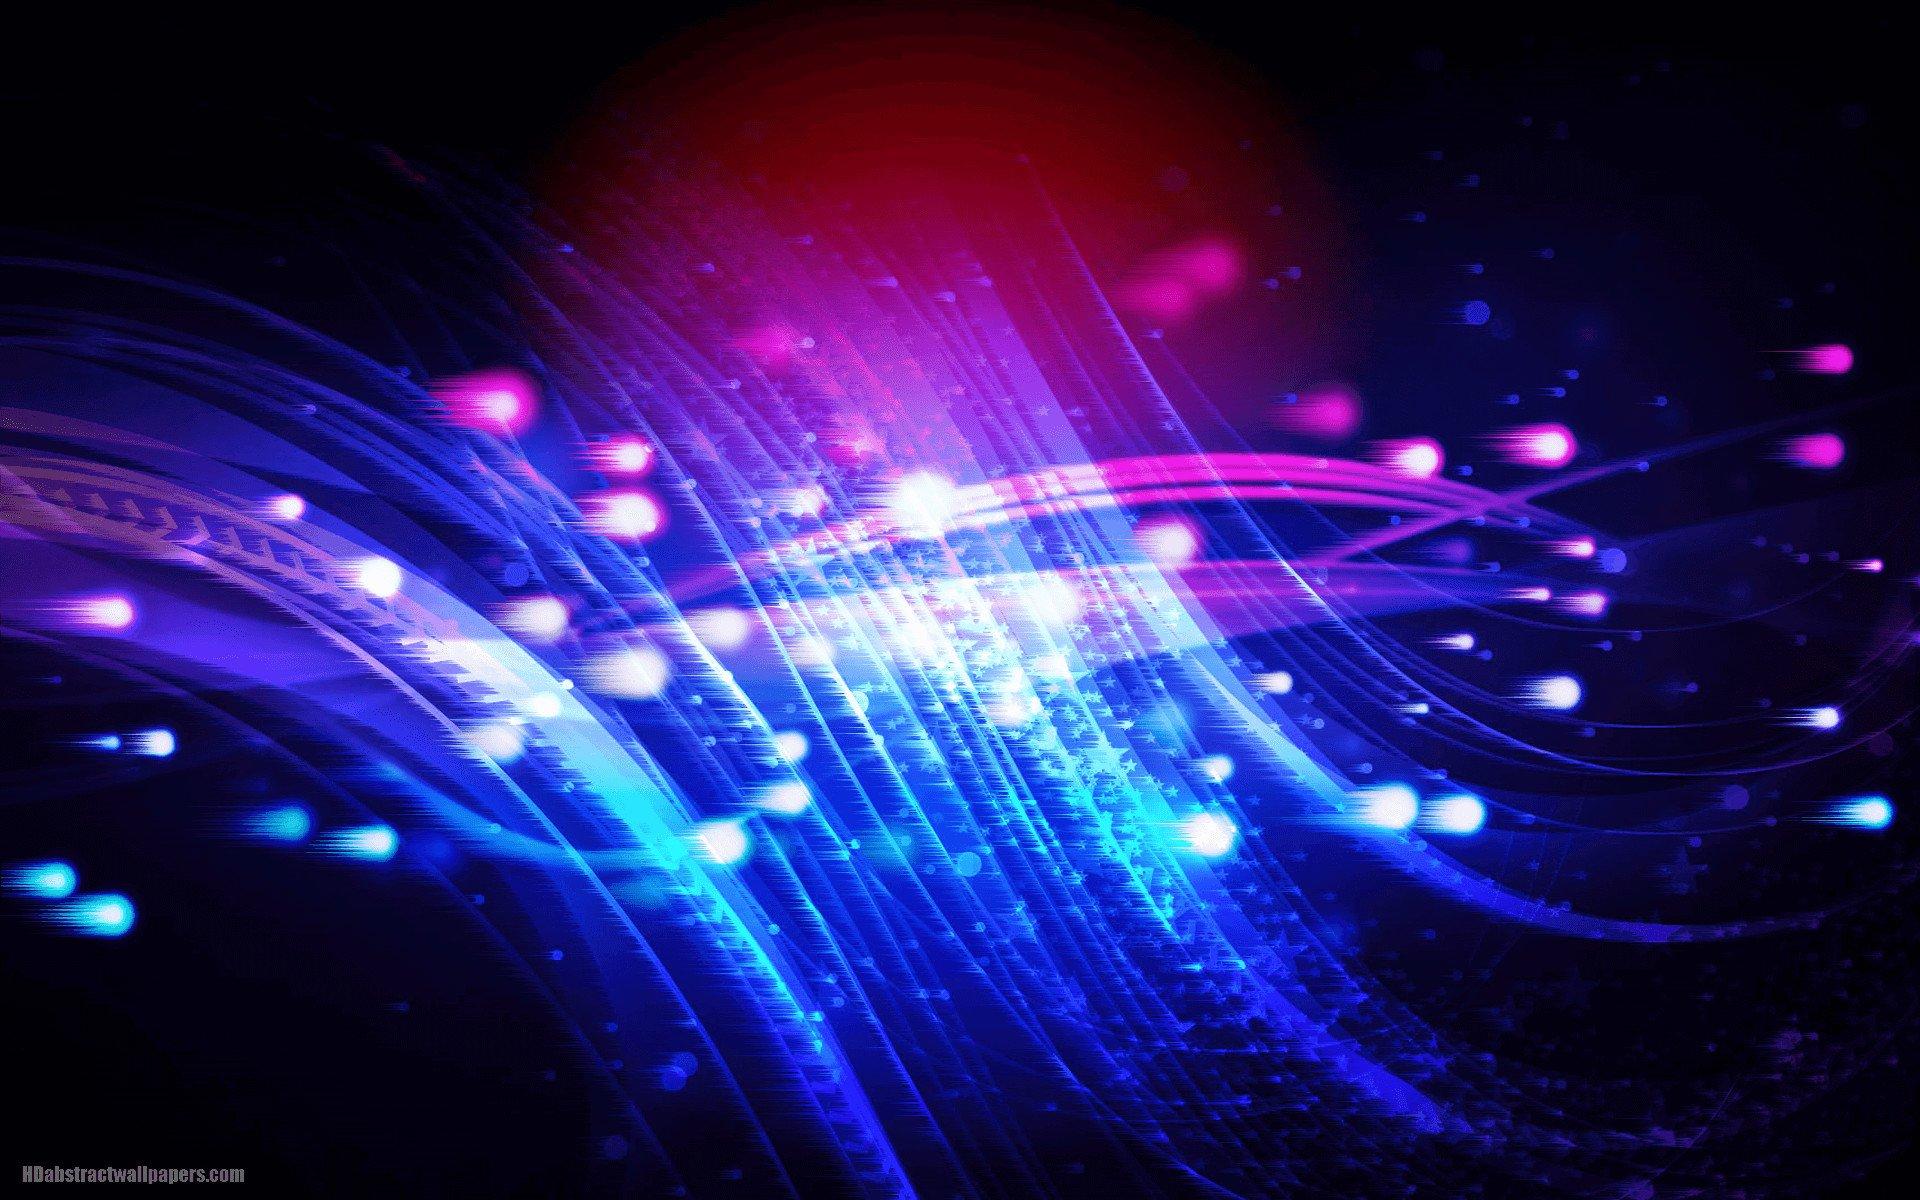 Hd Pc Edm Wallpapers 66 Images Prodigious Light Level Wallpaper 19x10 Wallpaper Teahub Io